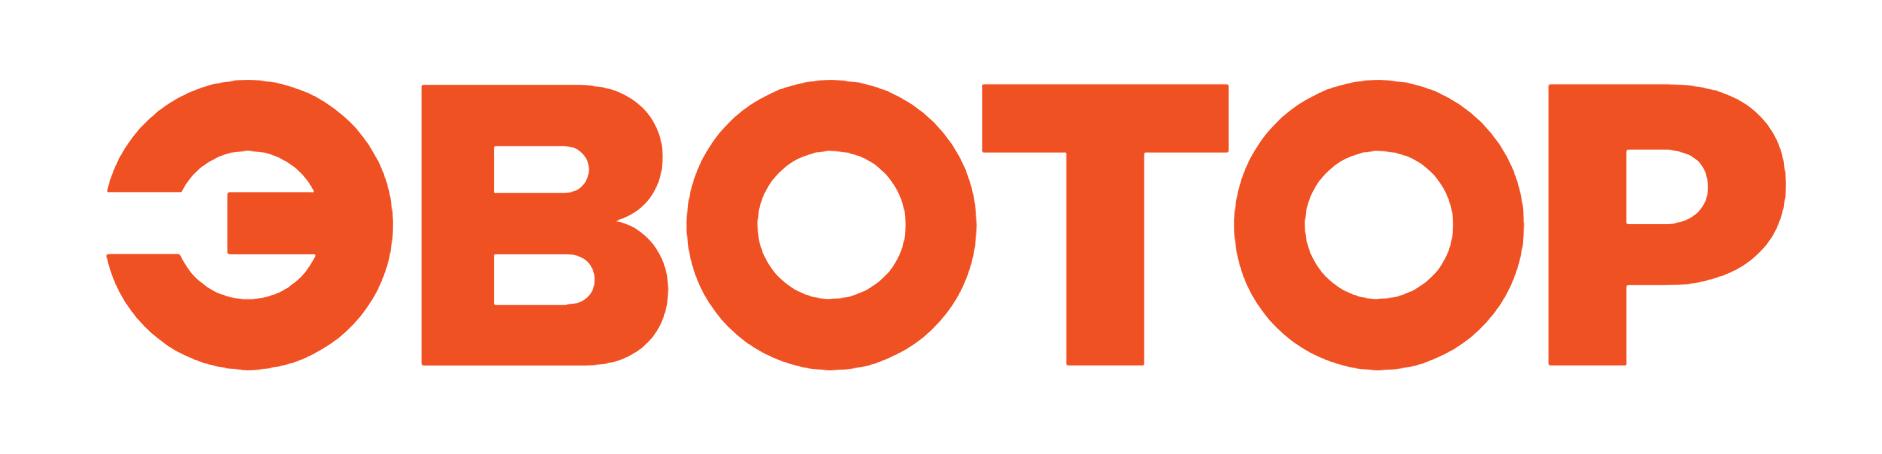 evotor-main.png